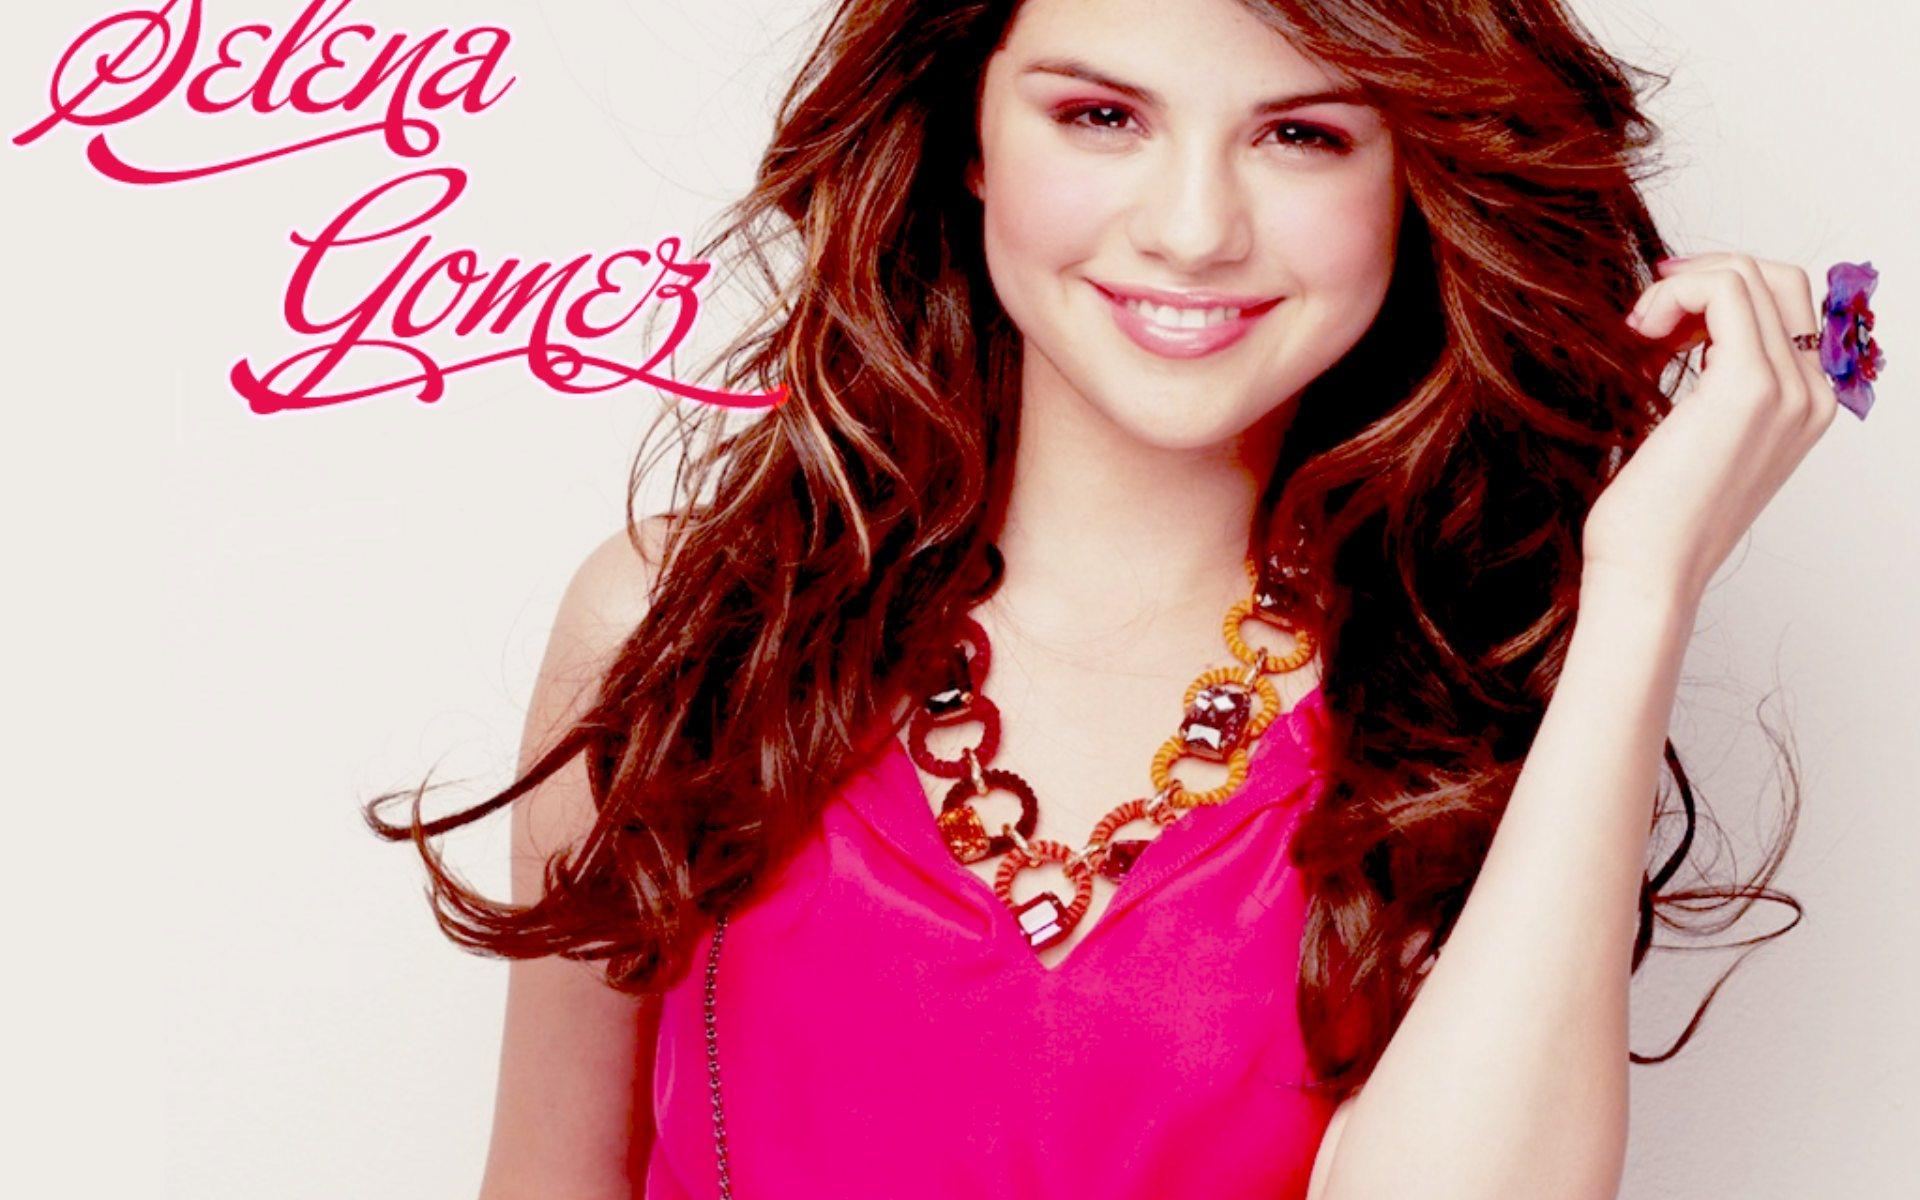 Selena gomez hot sexy hd wallpapers gotsohot voltagebd Choice Image